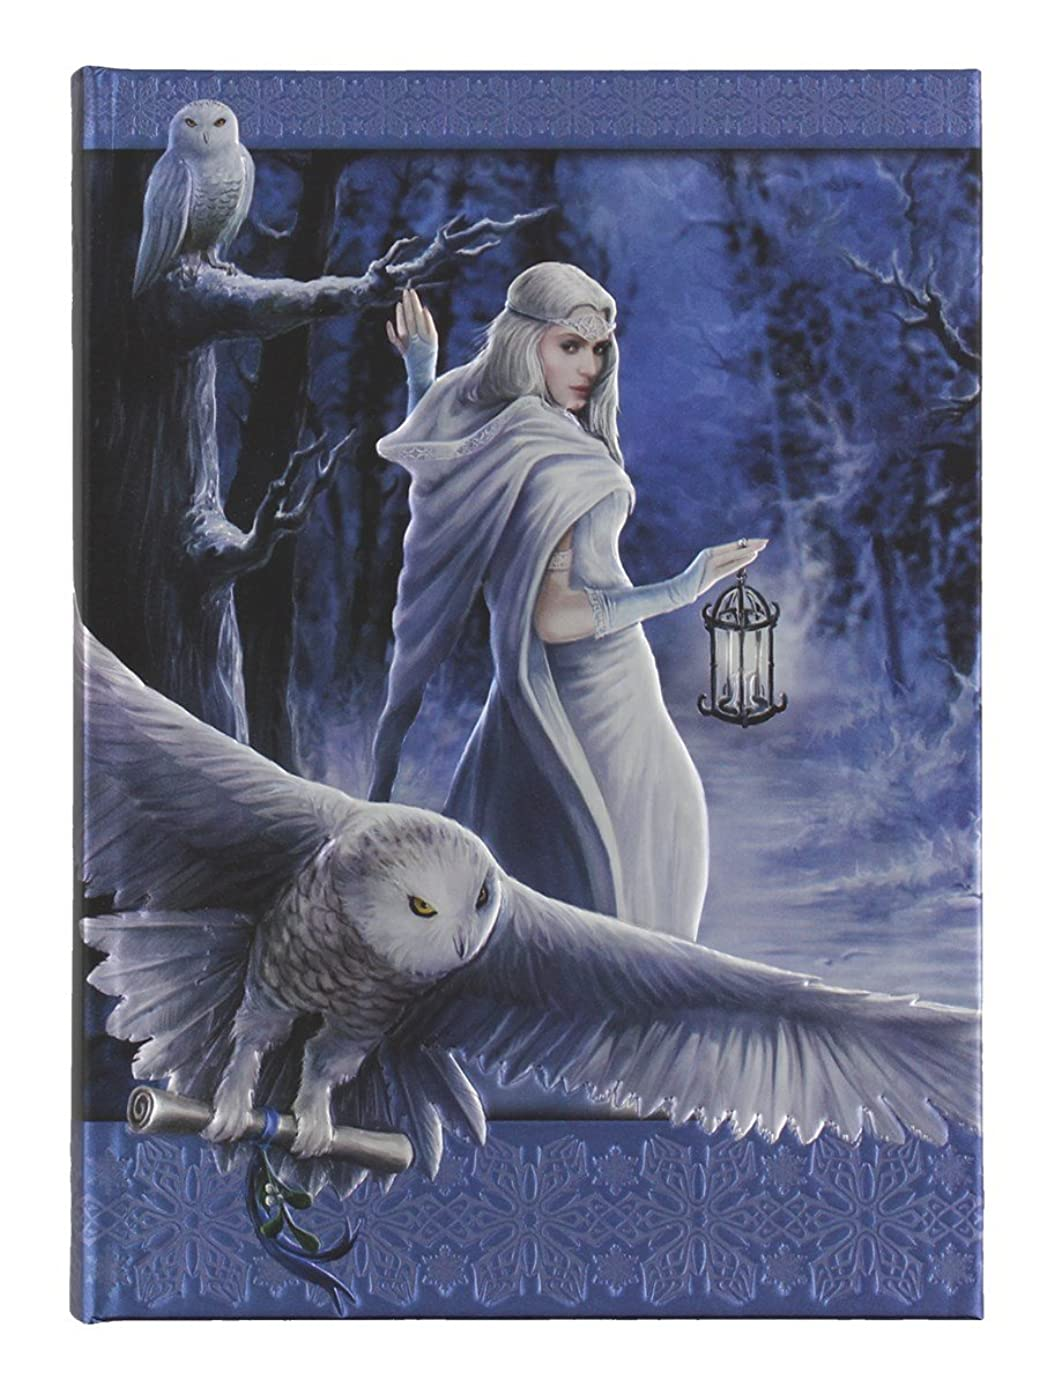 Anne Stoke Curiosity Corner Midnight Messenger with Owl Embossed Journal